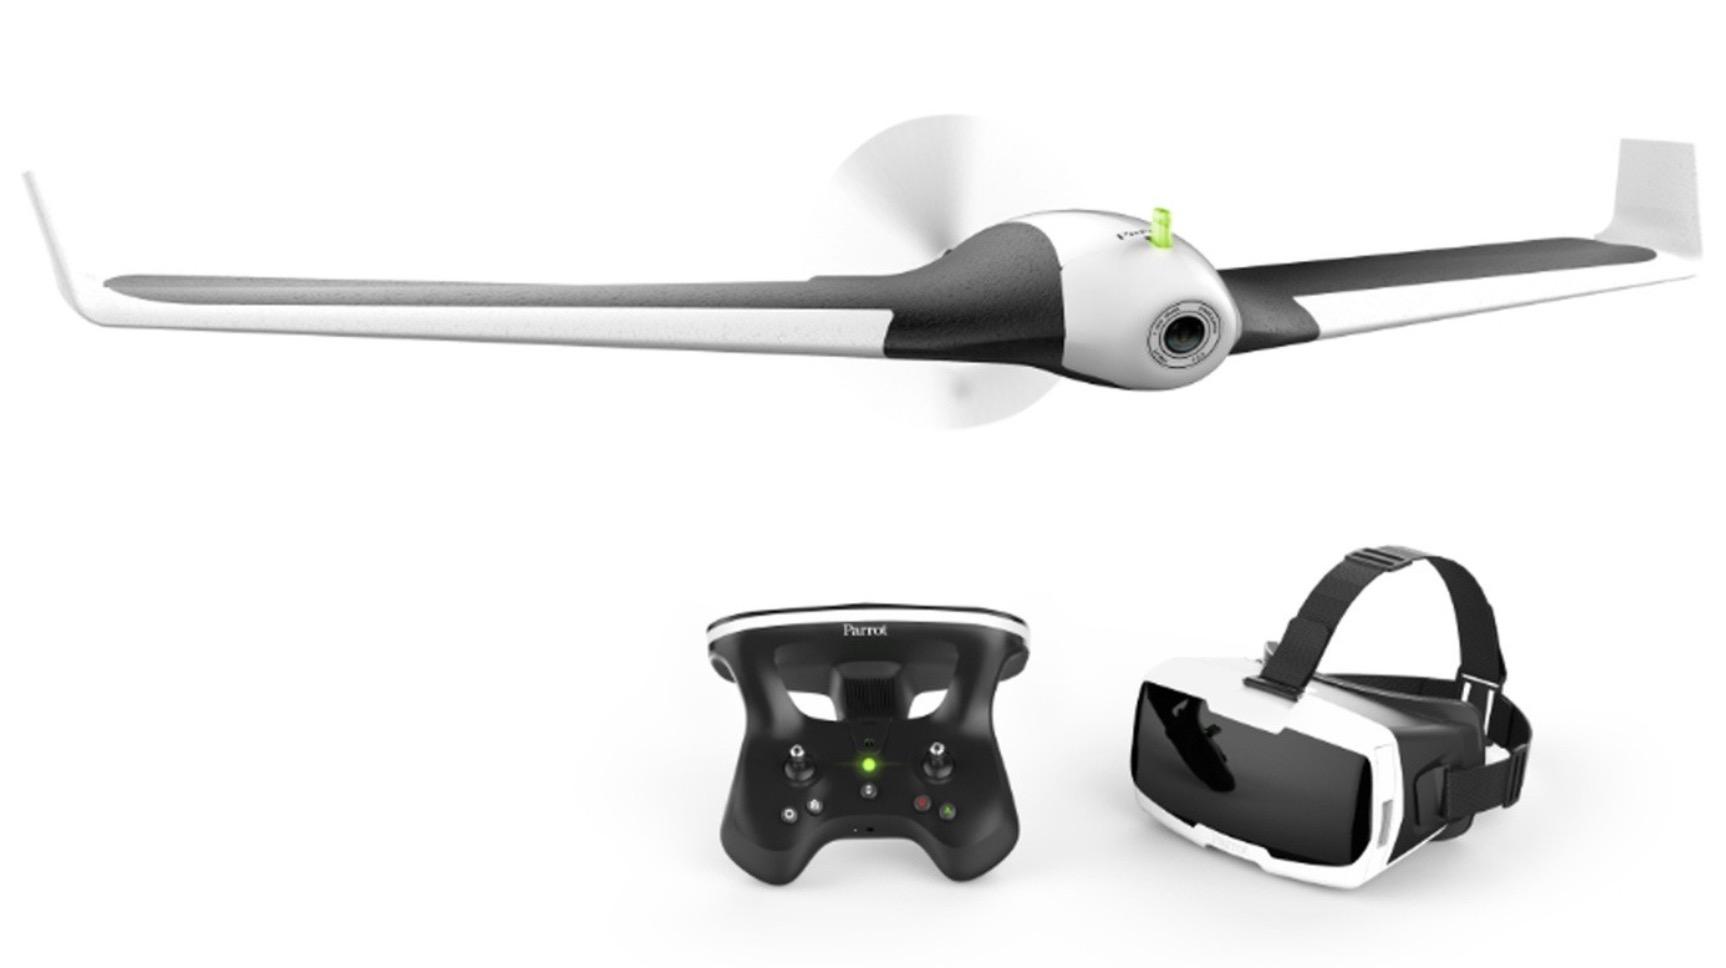 Code promo Darty : Drone Parrot Disco FPV + lunettes Immersion + radiocommande à 249,99€ (+30€ offerts en carte cadeau)